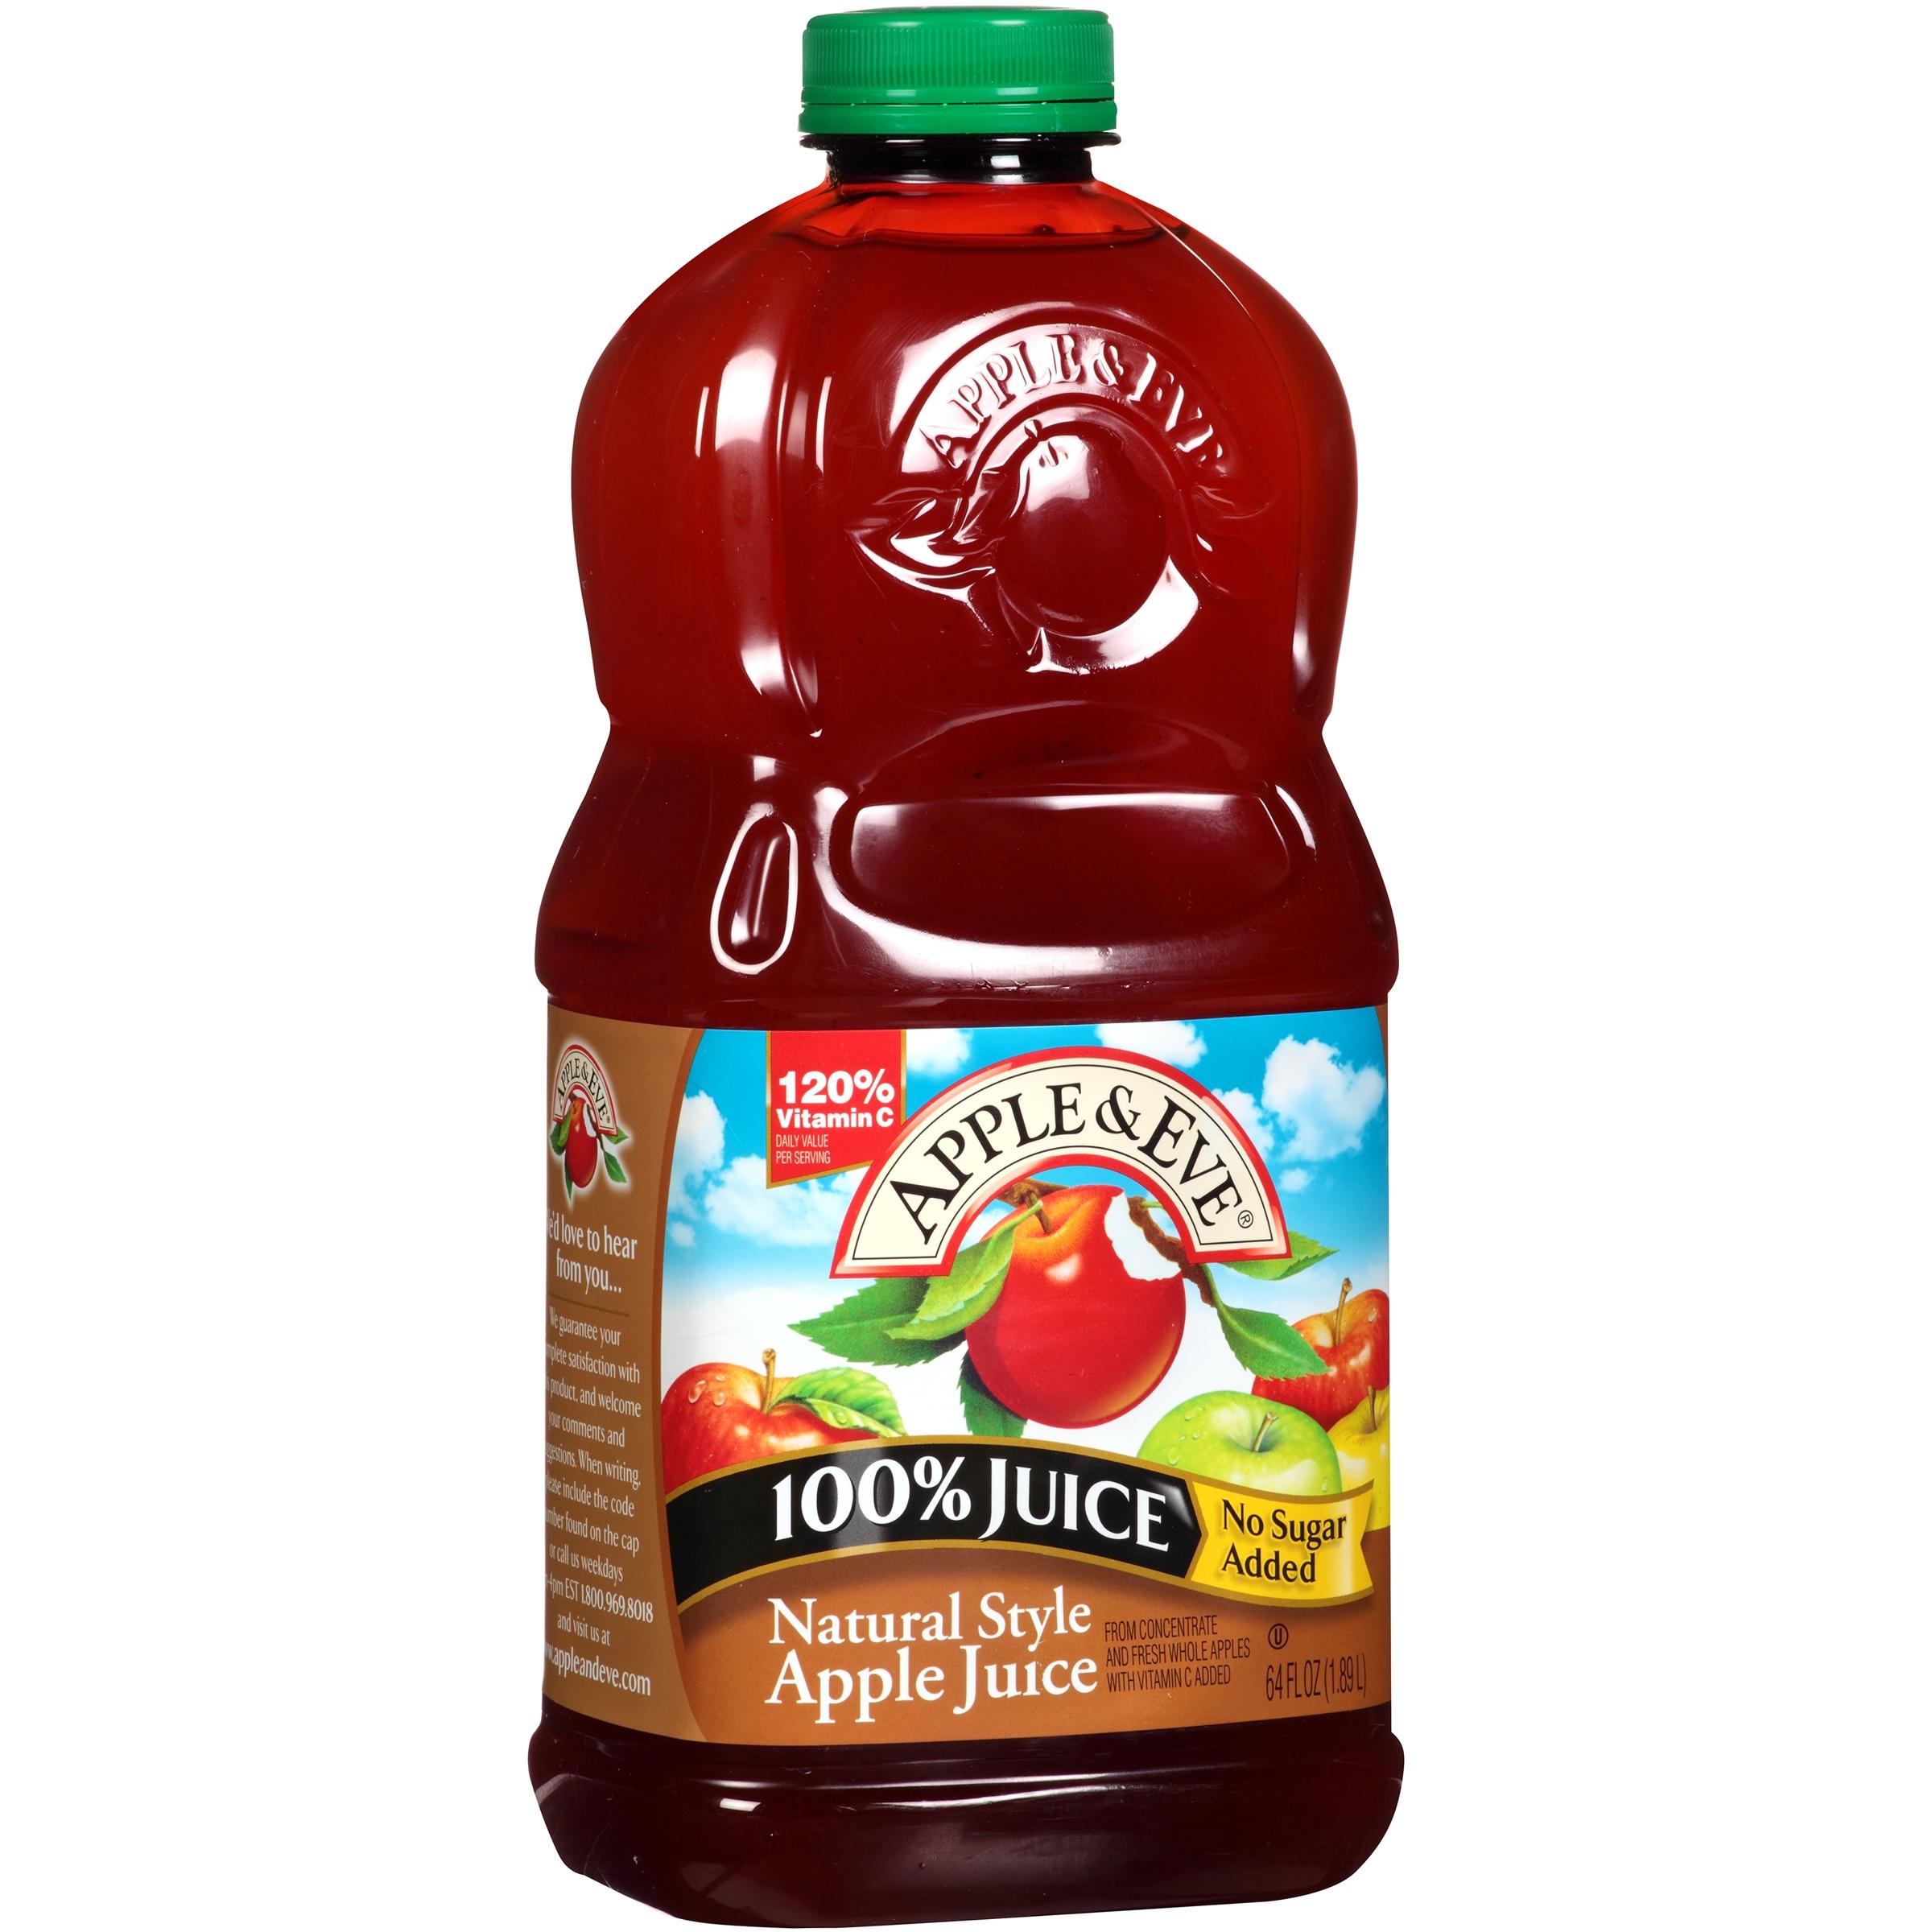 Apple Eve Natural Style Apple 100 Juice 64 fl oz